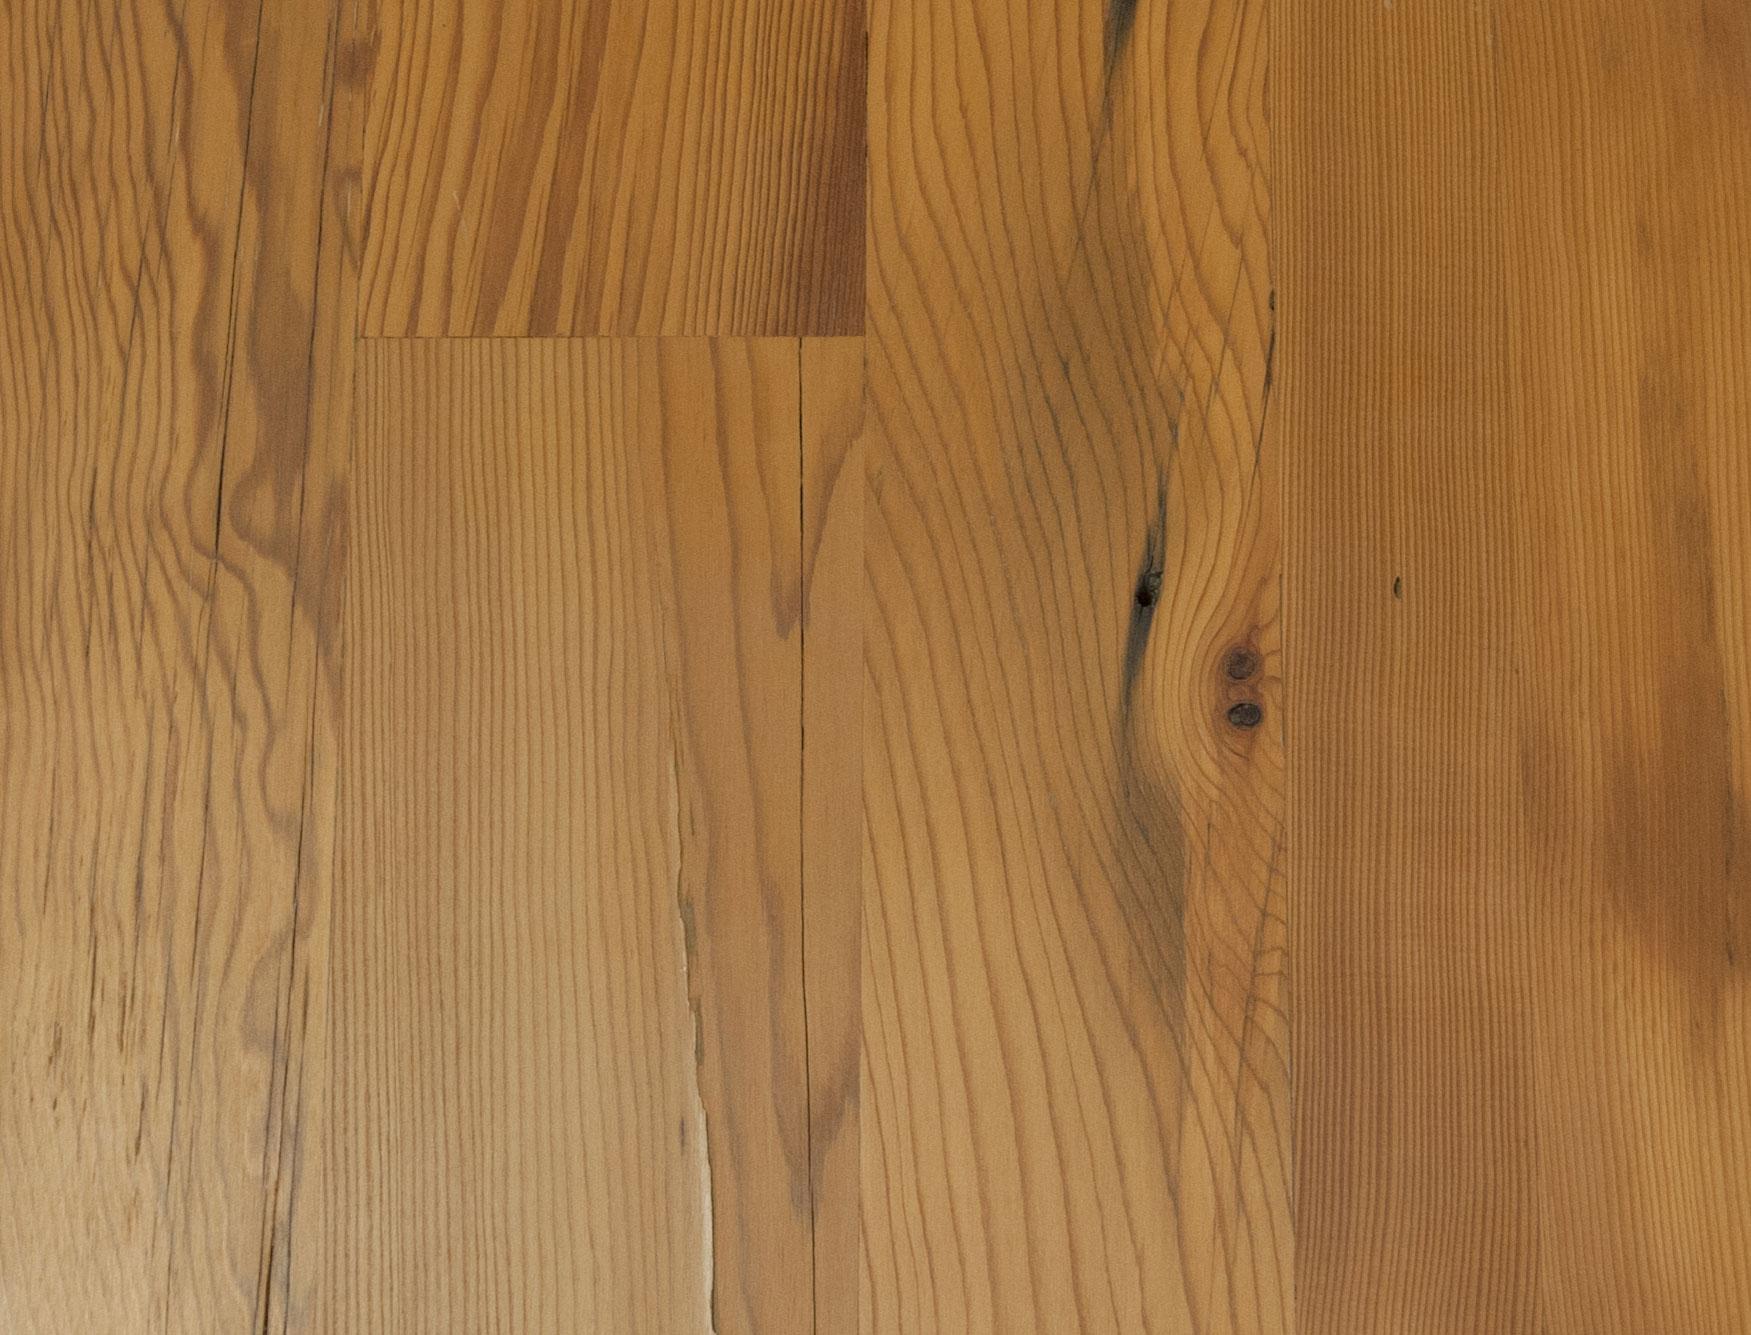 Vintage Hemlock Vintage Lumber Vintage Lumber